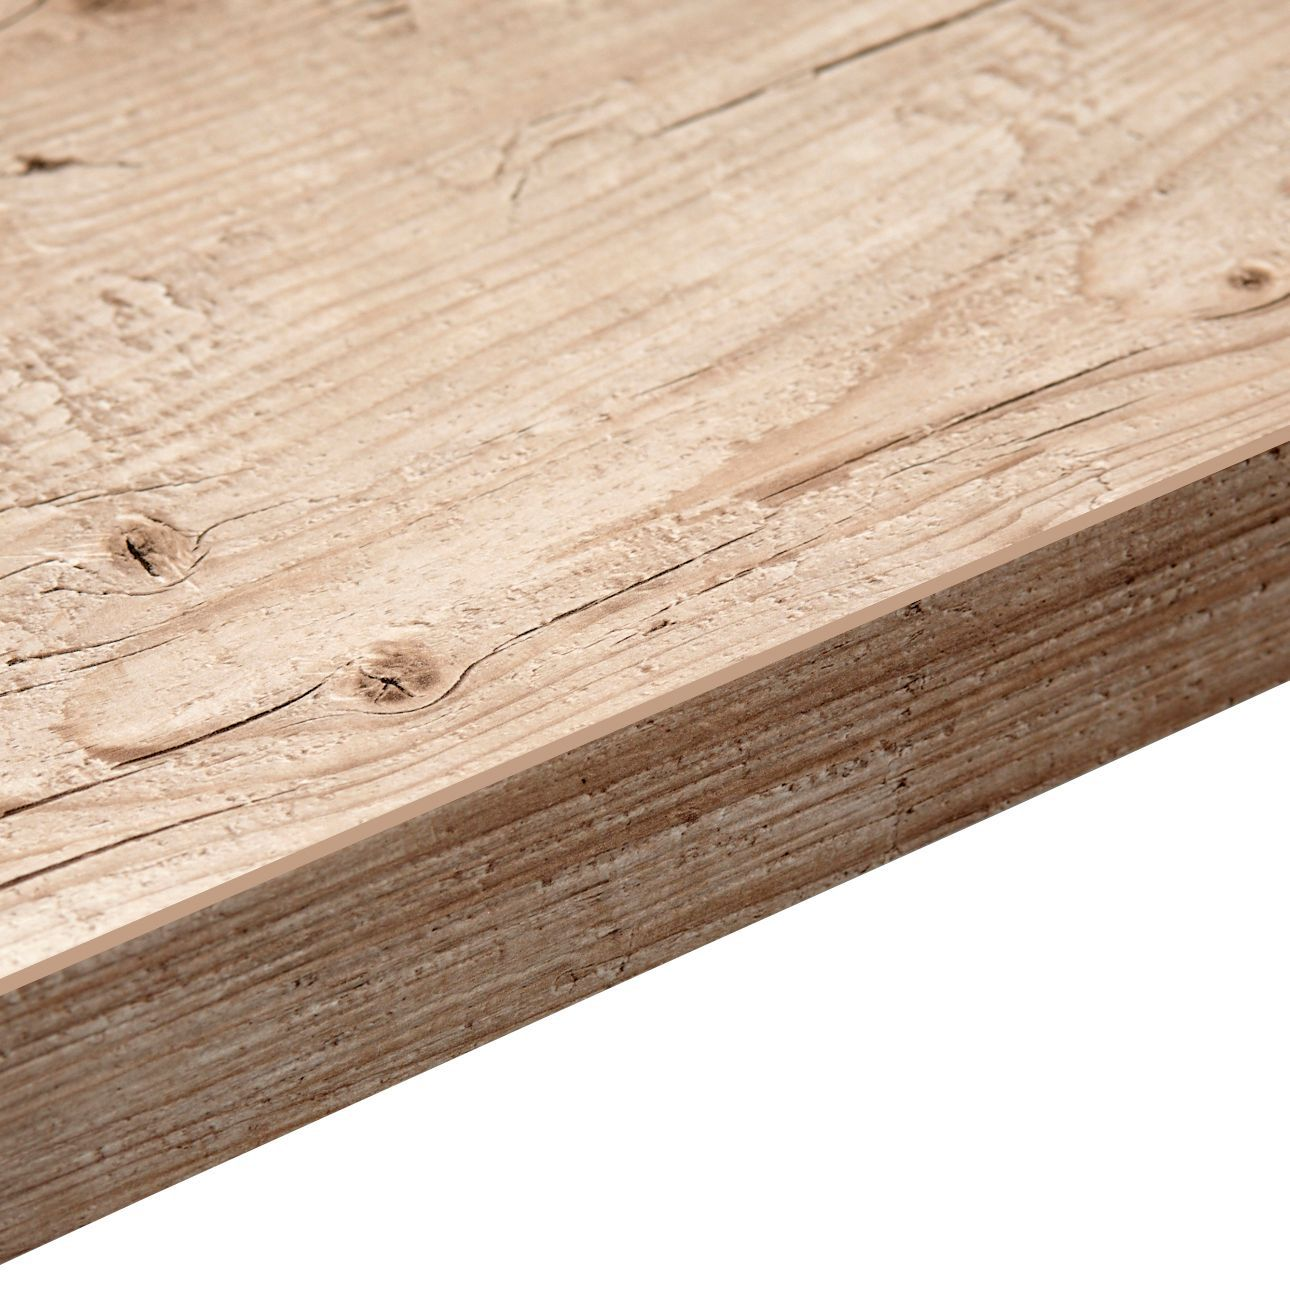 Laminate Wood Kitchen Worktops: 38mm B&Q Capitol Pine Laminate Astral Dove Wood Effect